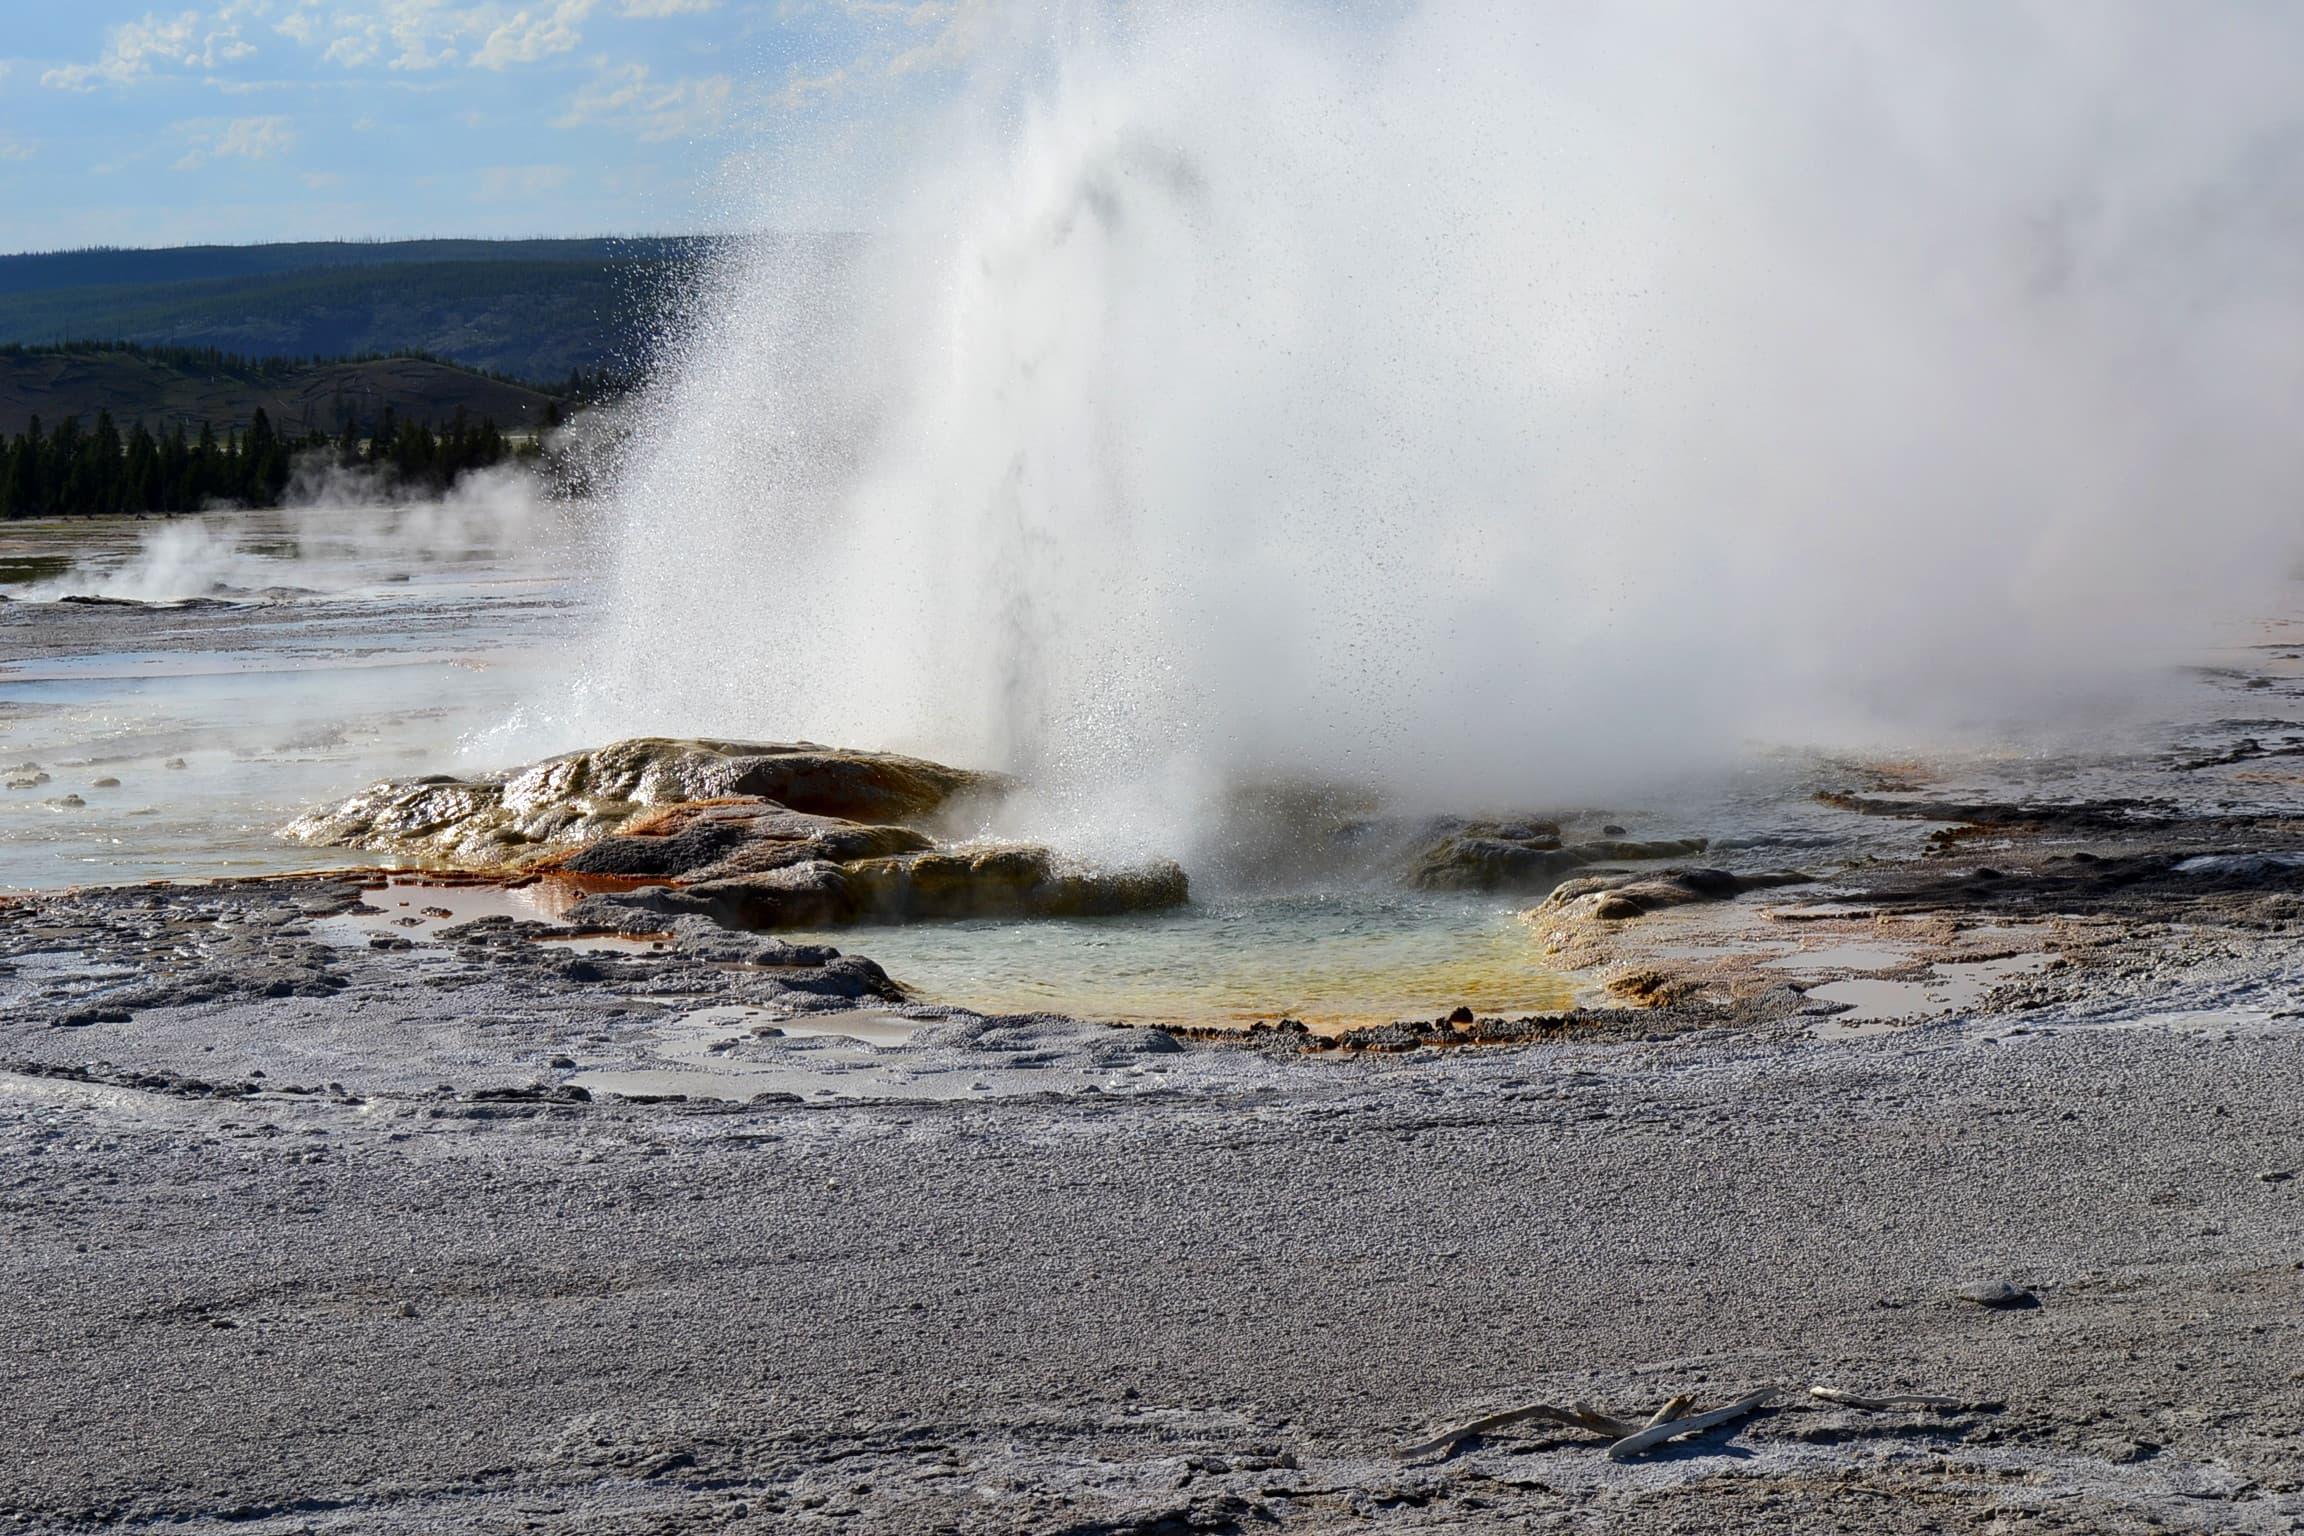 Second photo of continuing geyser eruption.